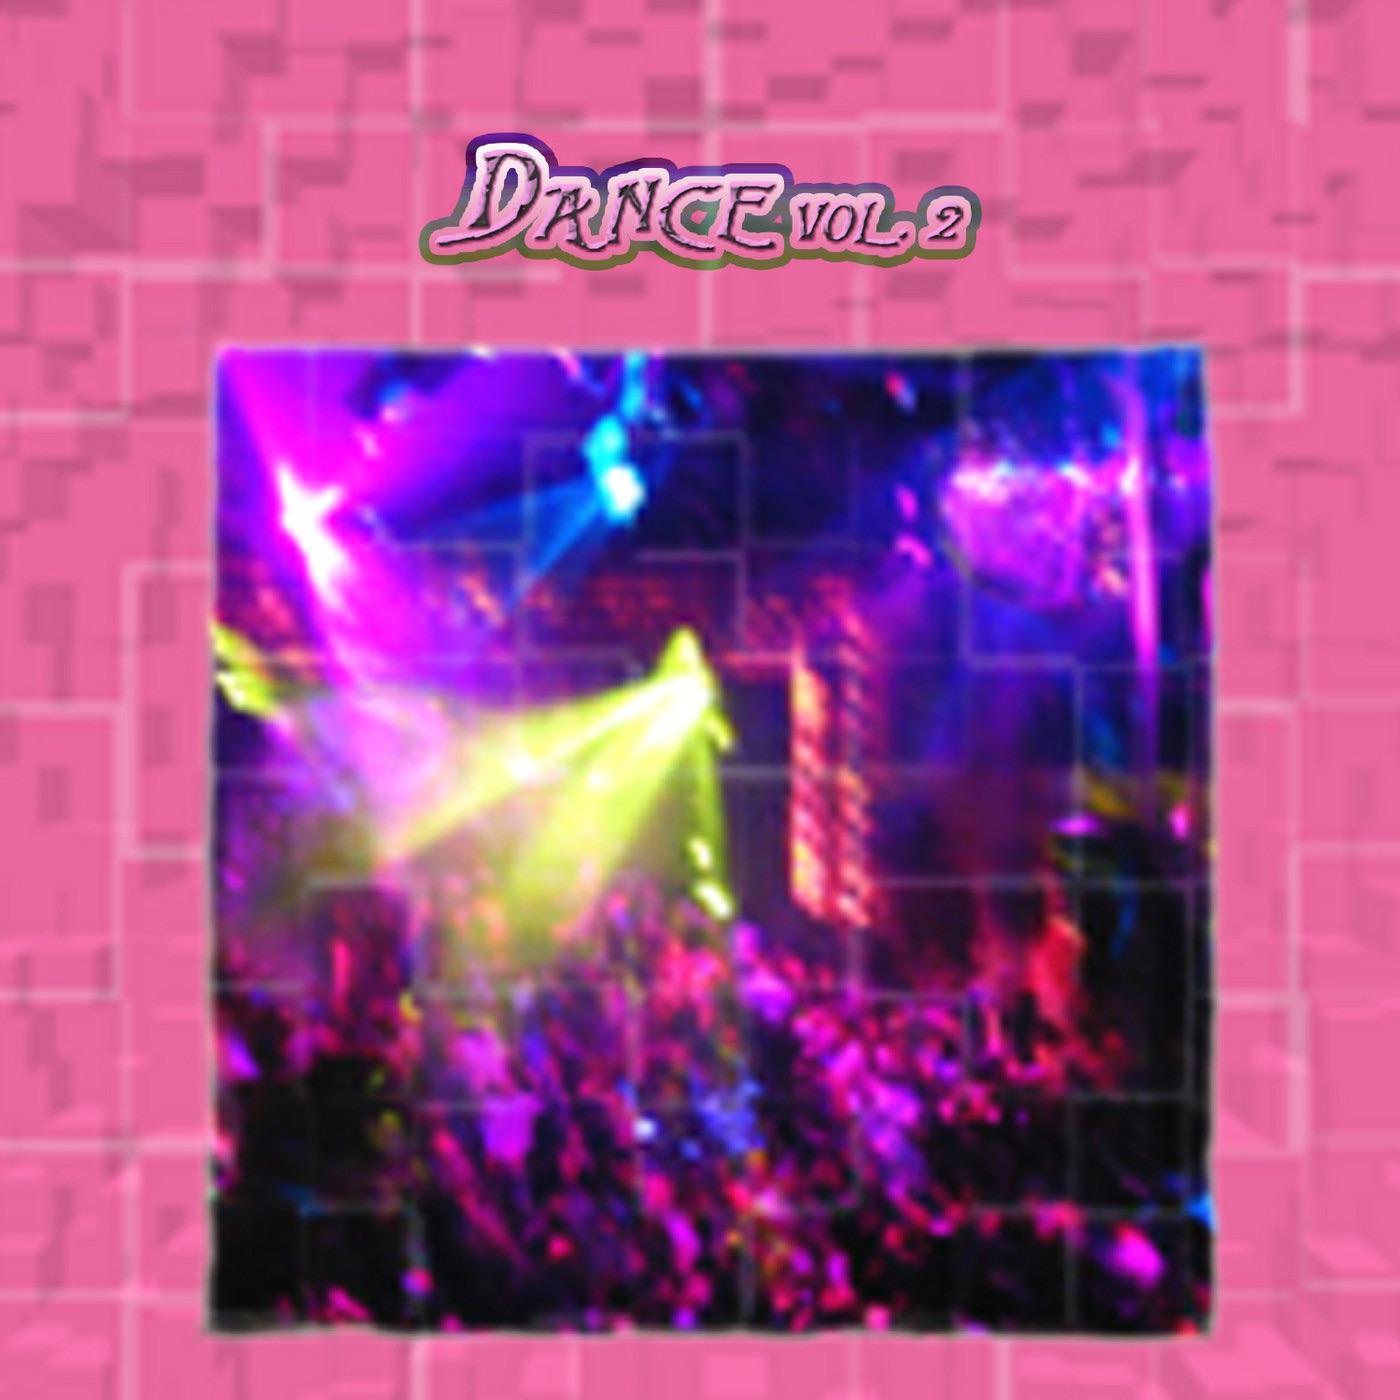 Dance Vol. 2